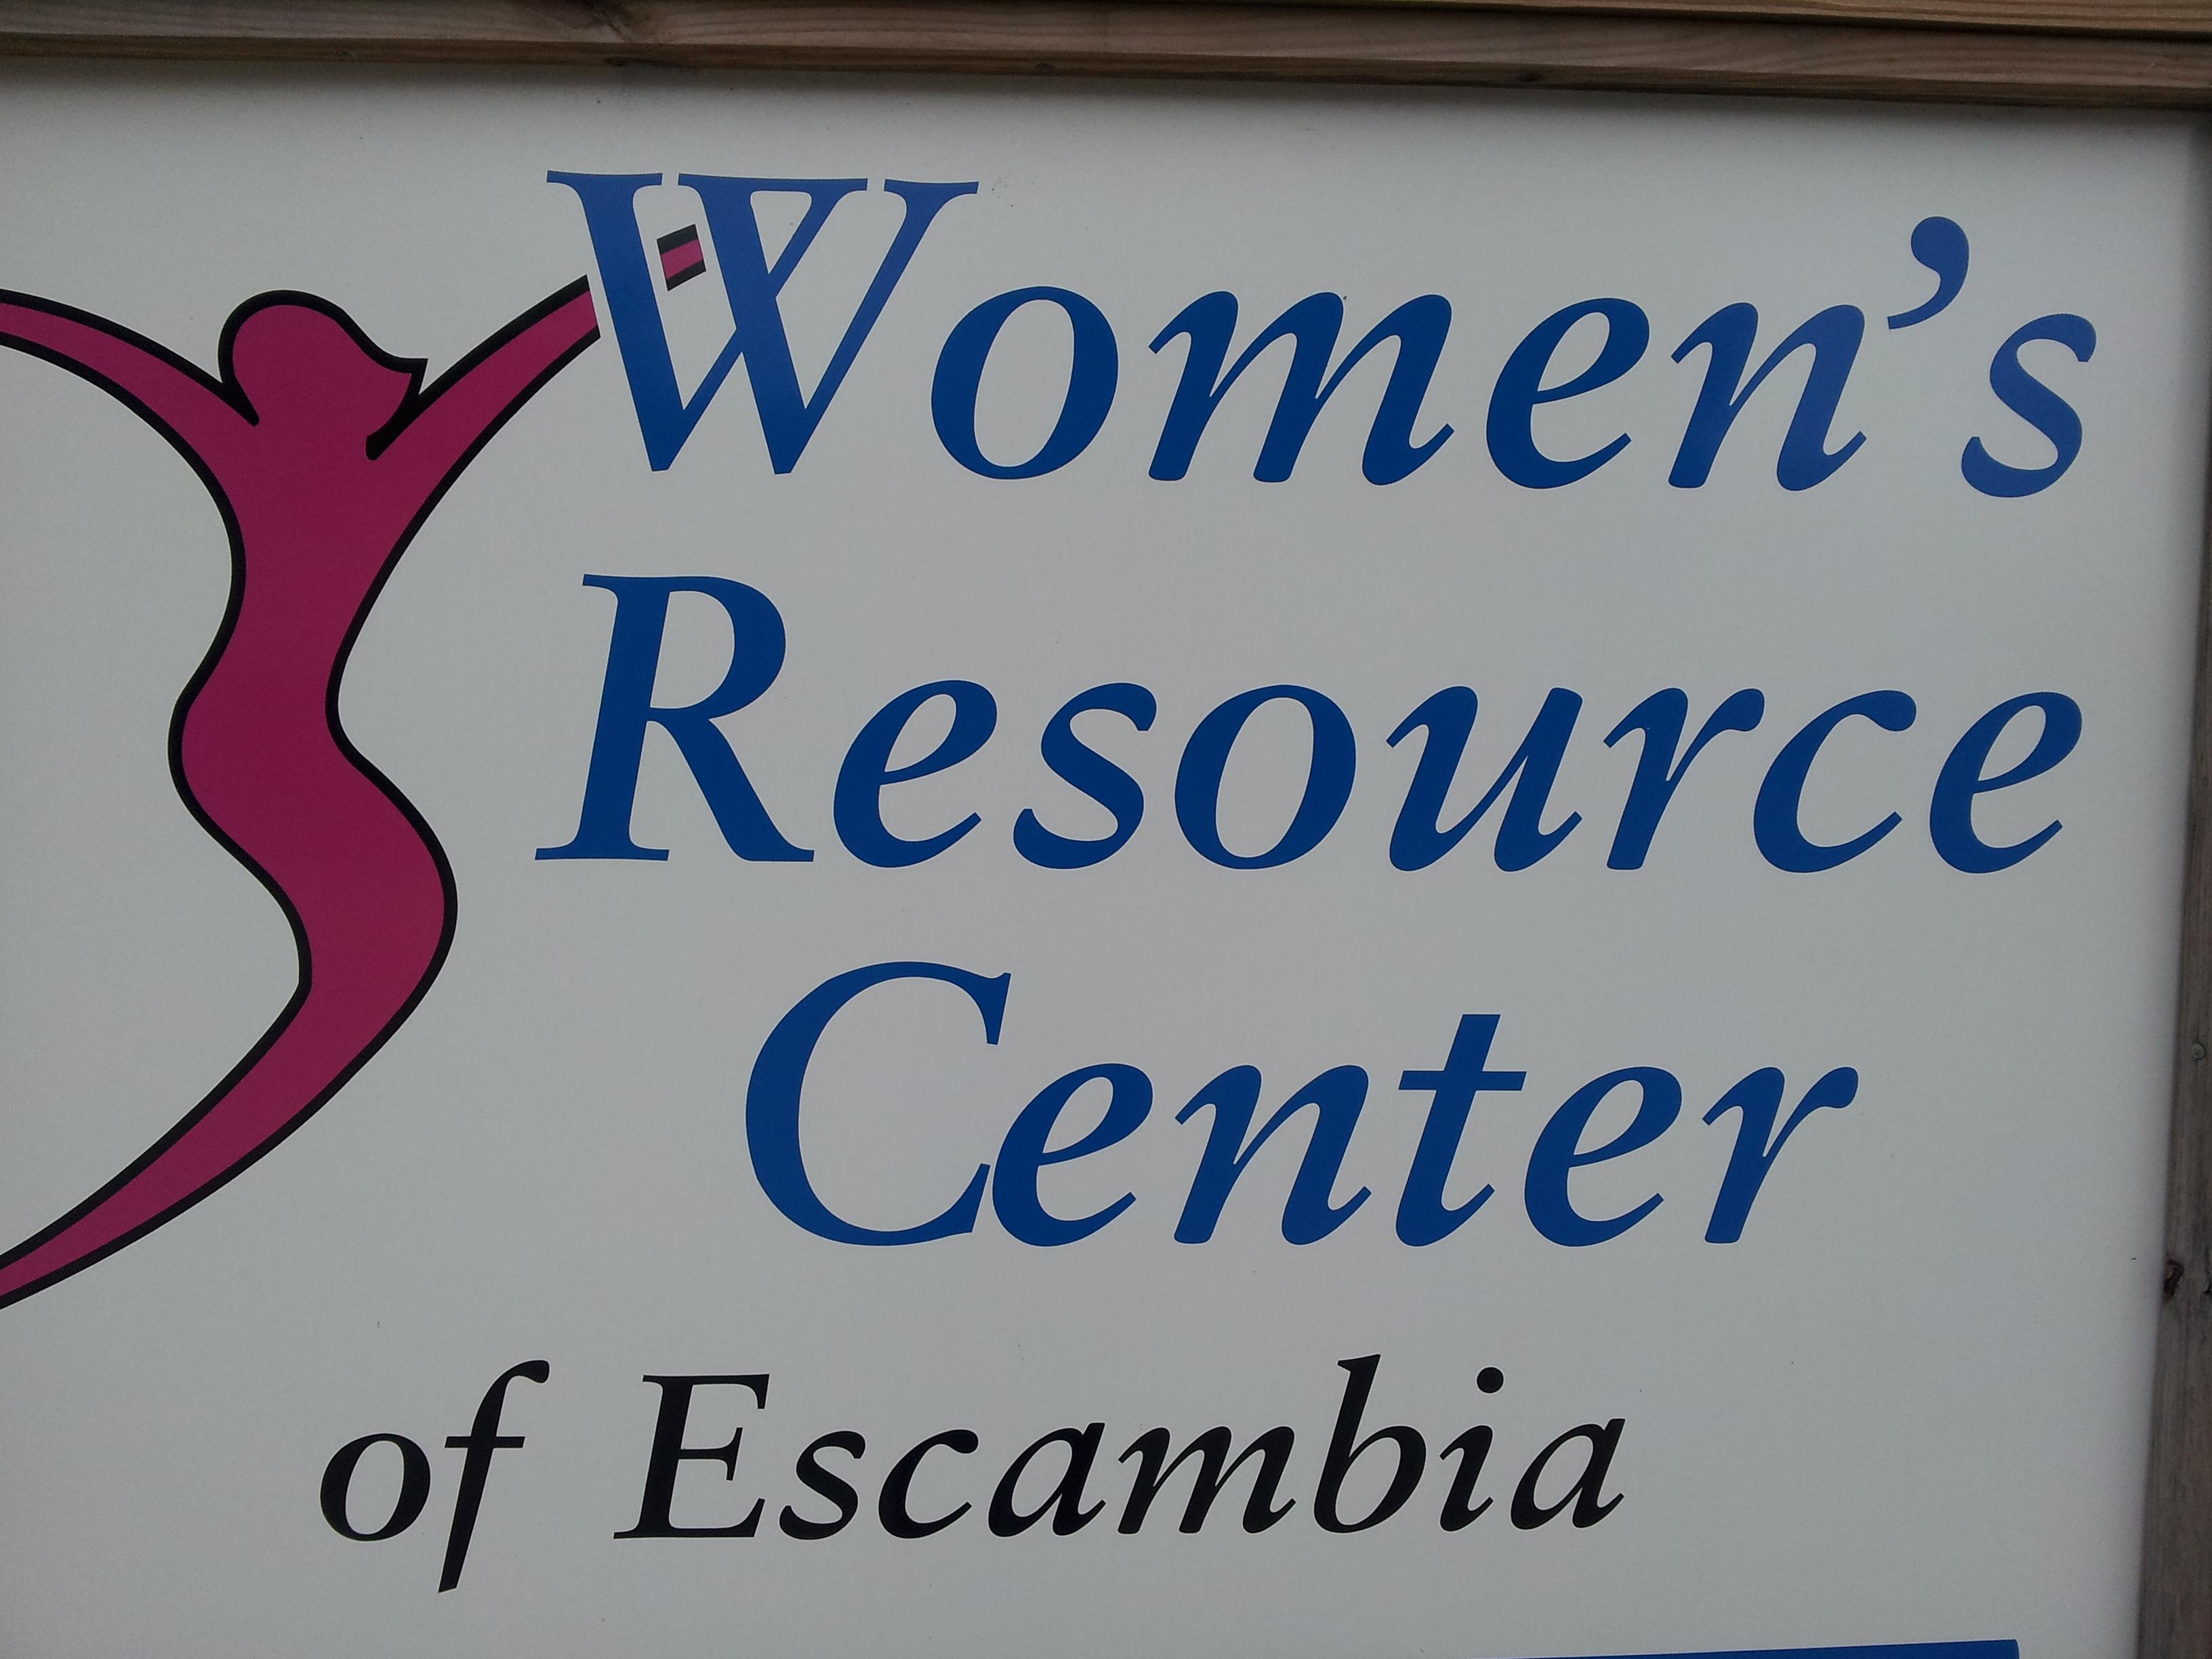 Women's Resource Center of Escambia